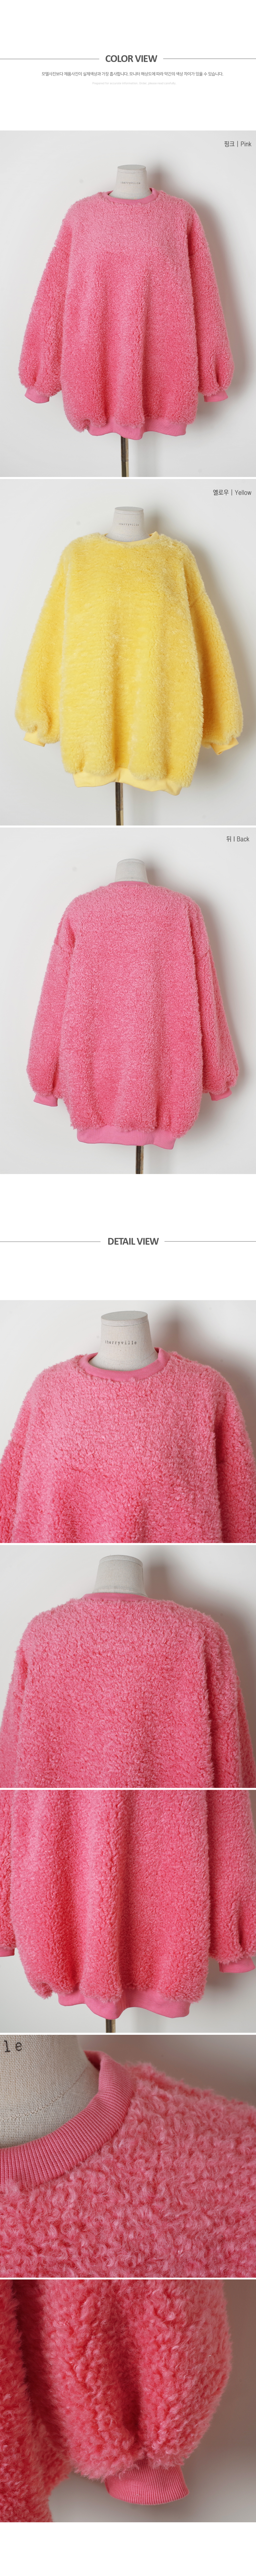 Vivid Fleece Boxy Dress